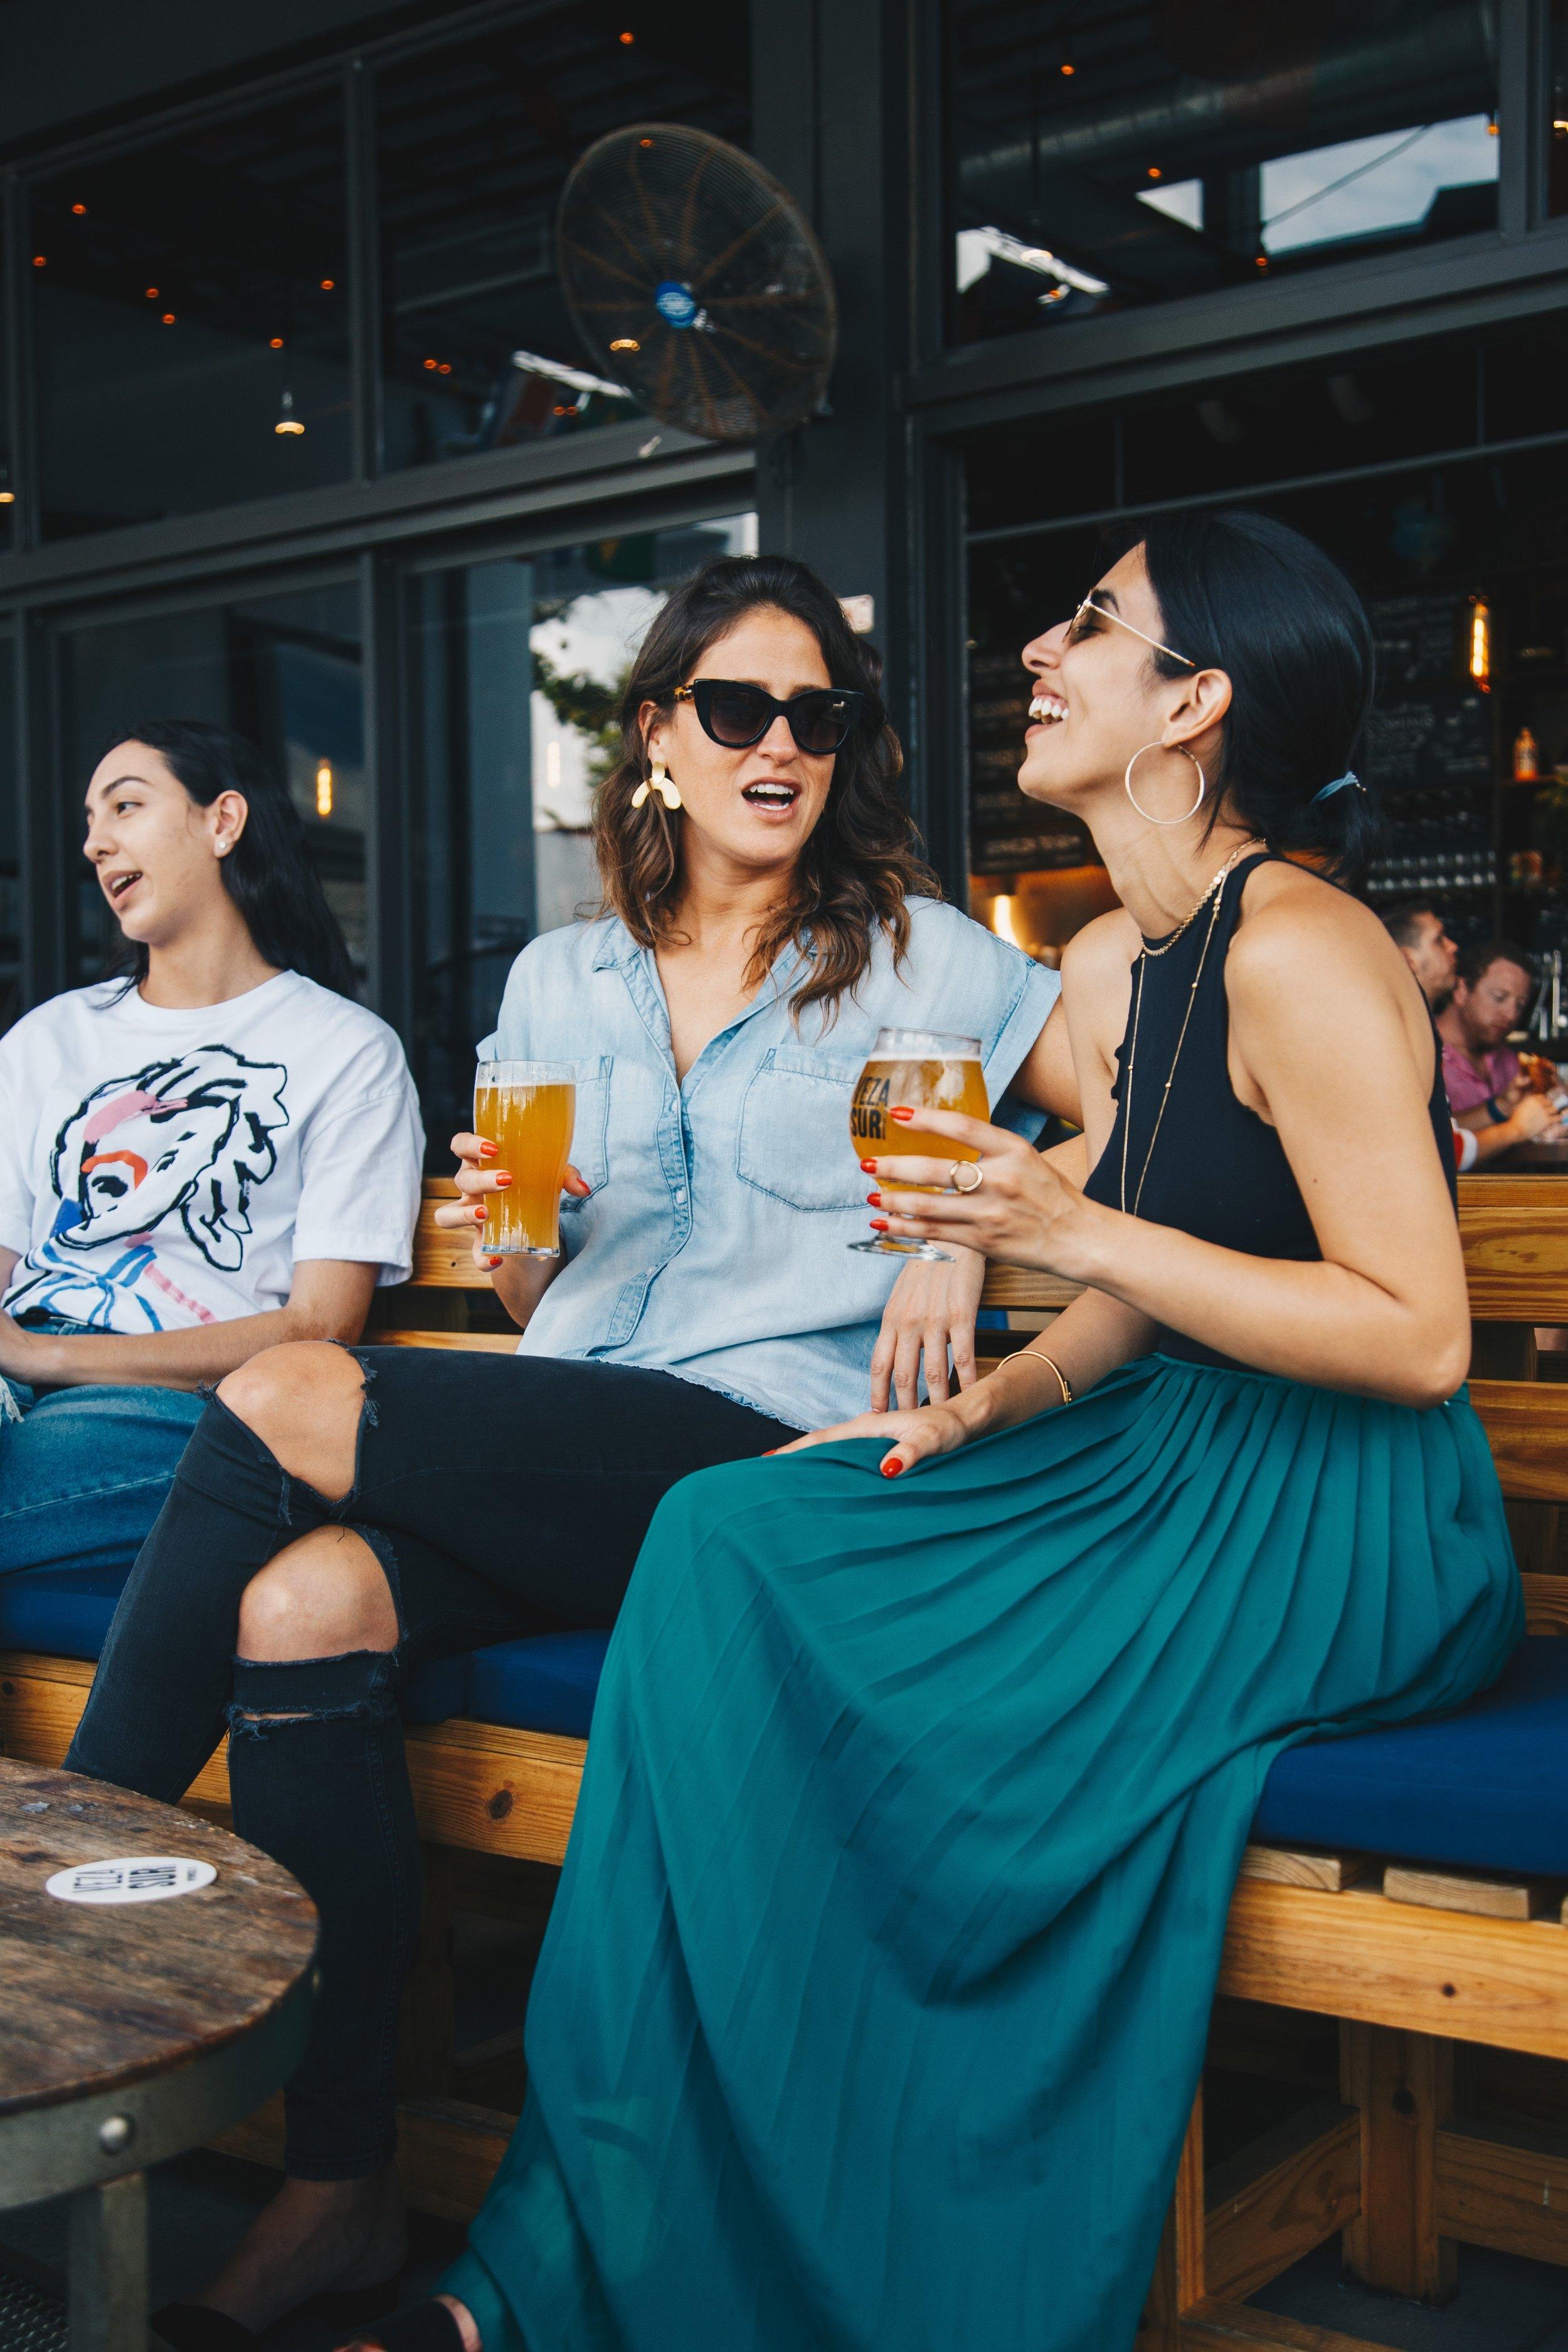 adults-alcoholic-beverage-bar-1267693.jpg